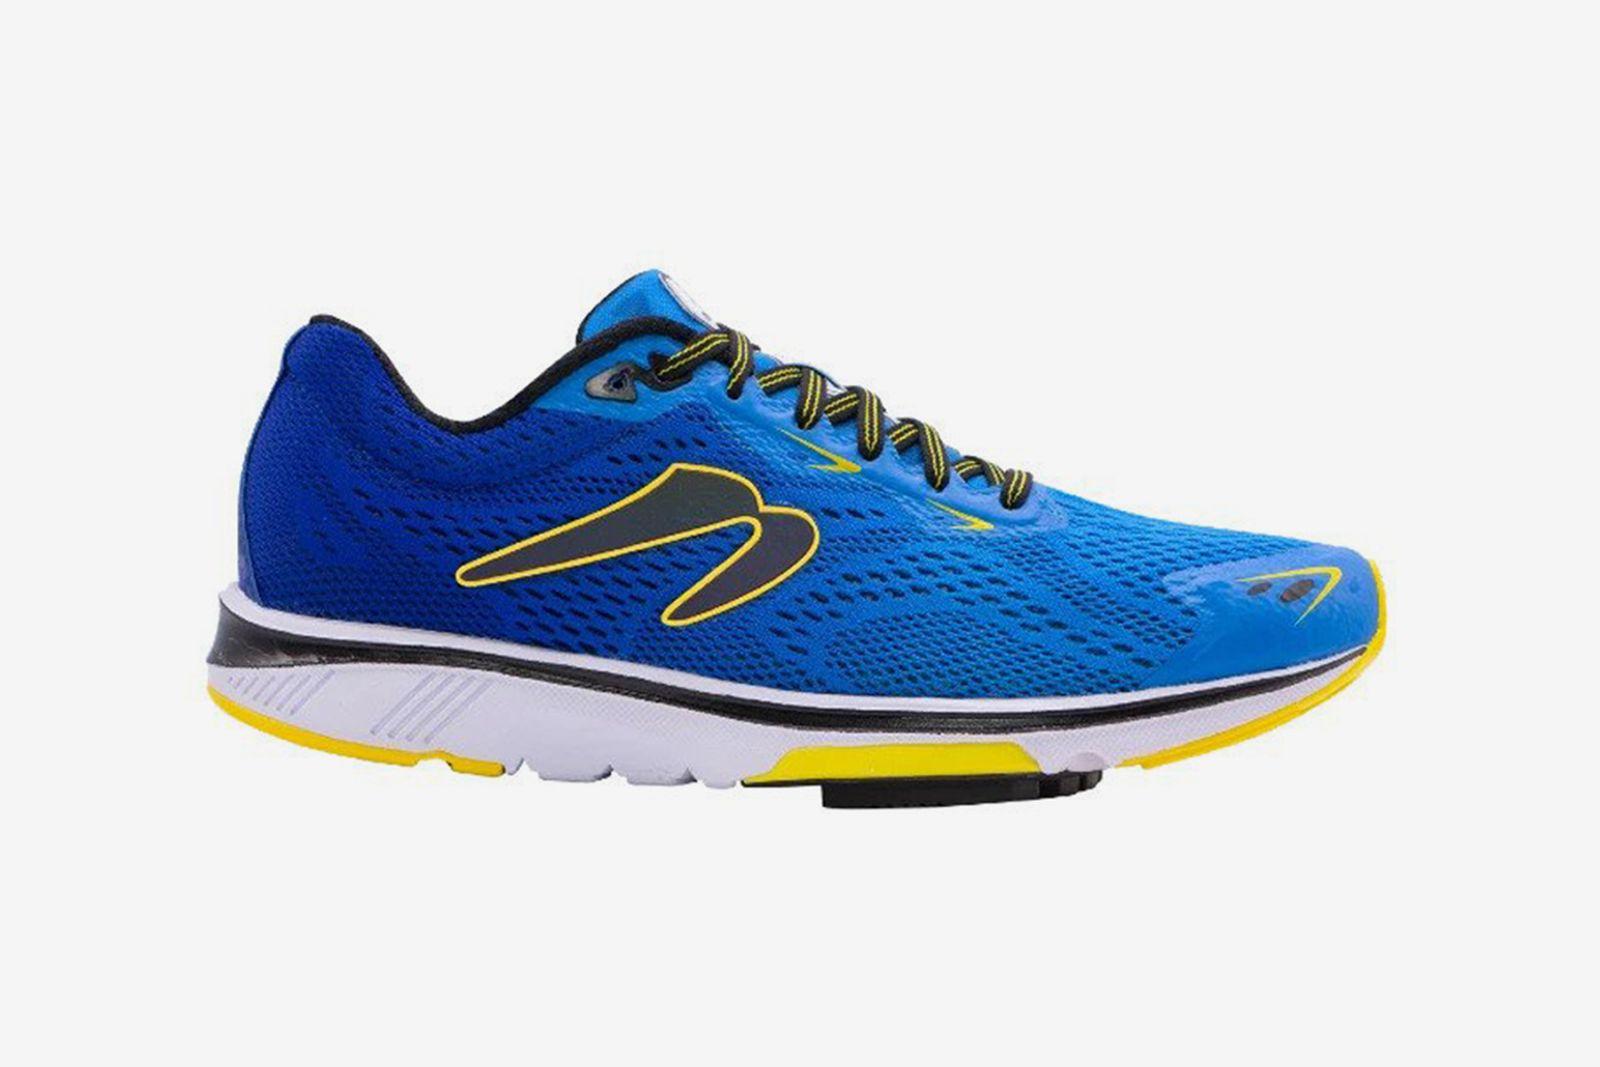 best-running-shoes-for-men-guide-salomon-nike-zoom-pegasus-newton-gravity-9